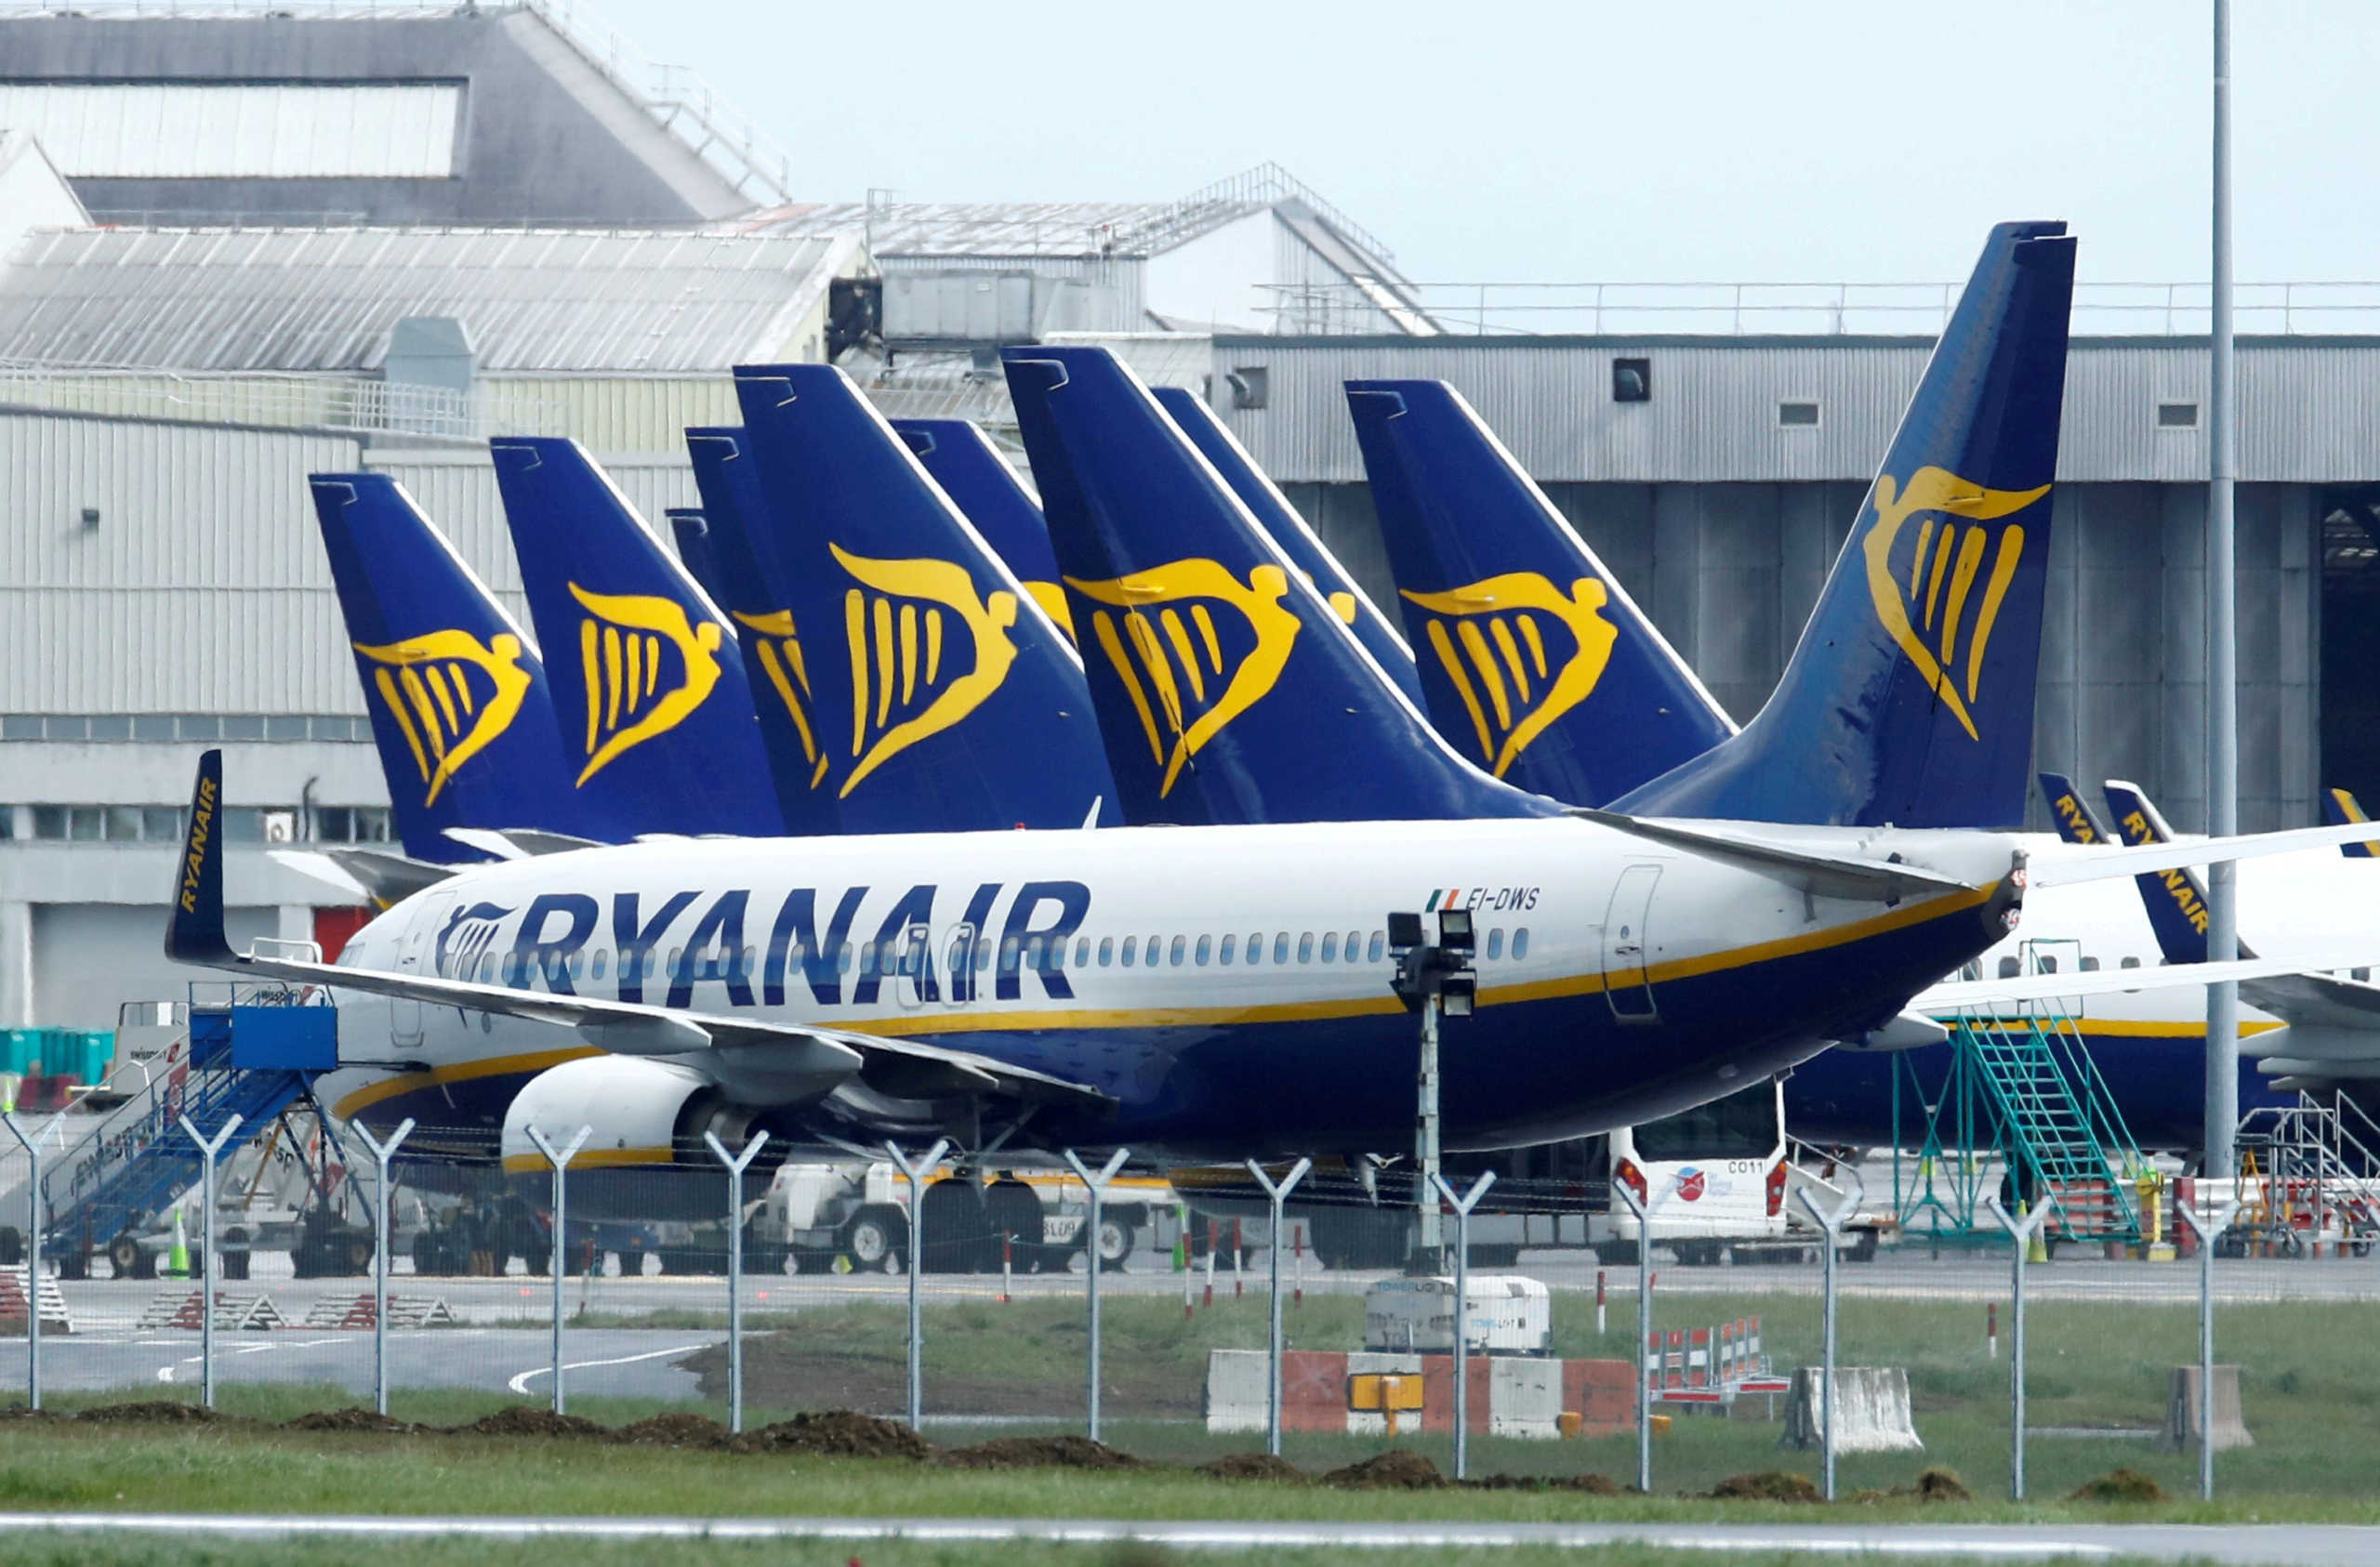 Ryanair: Μειώνει κατά 20% επιπλέον το προσωπικό της